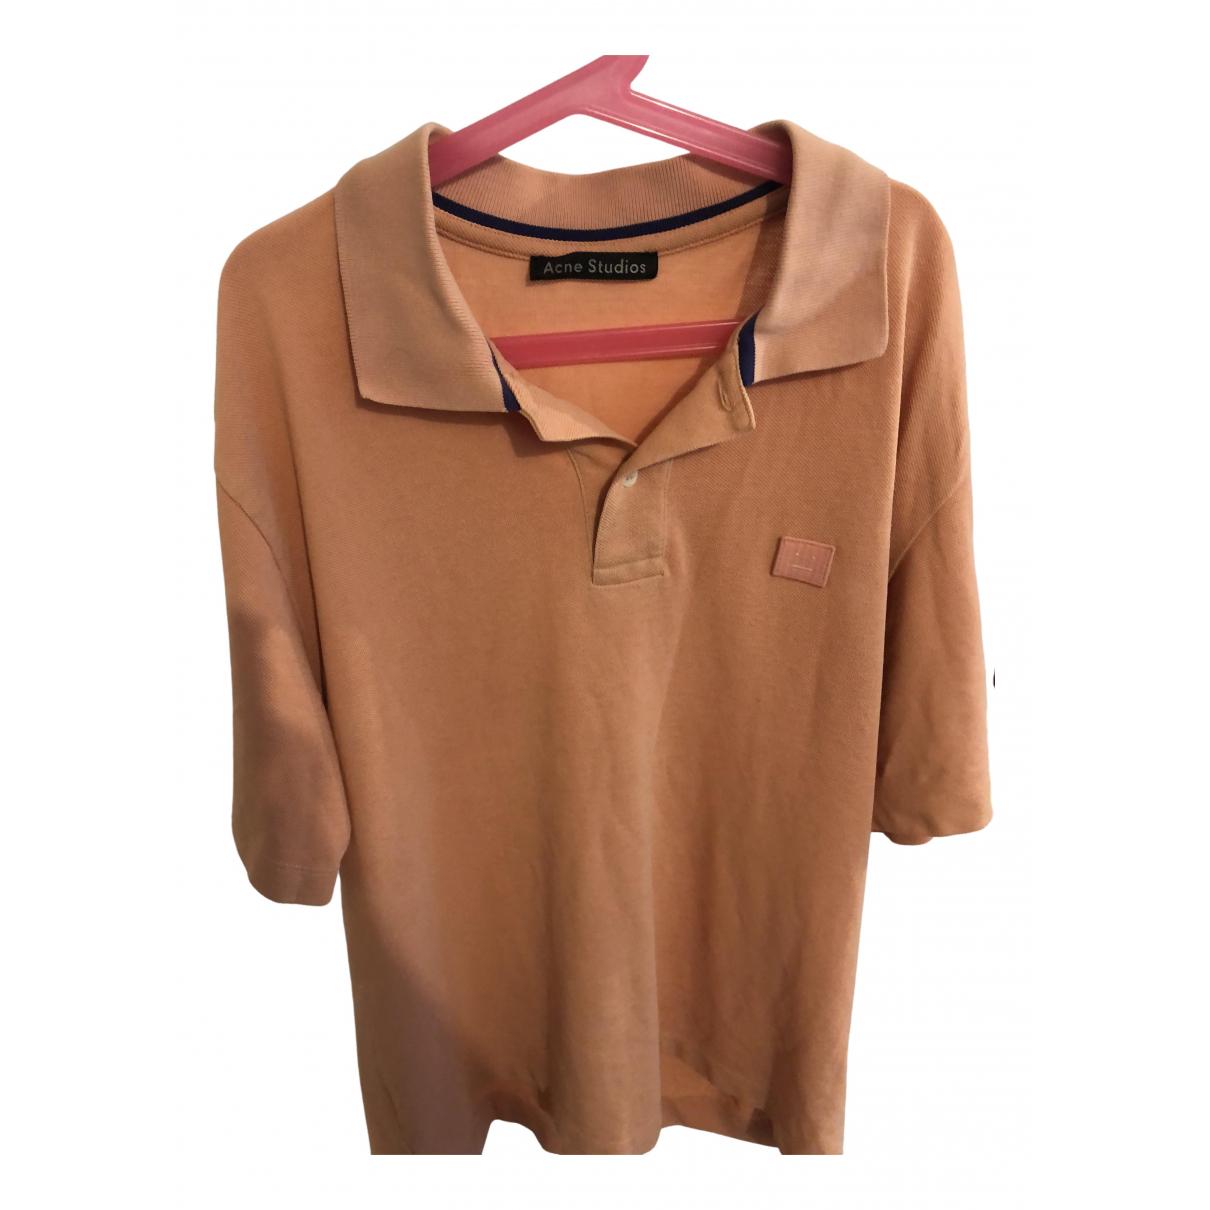 Acne Studios \N Beige Polo shirts for Men M International